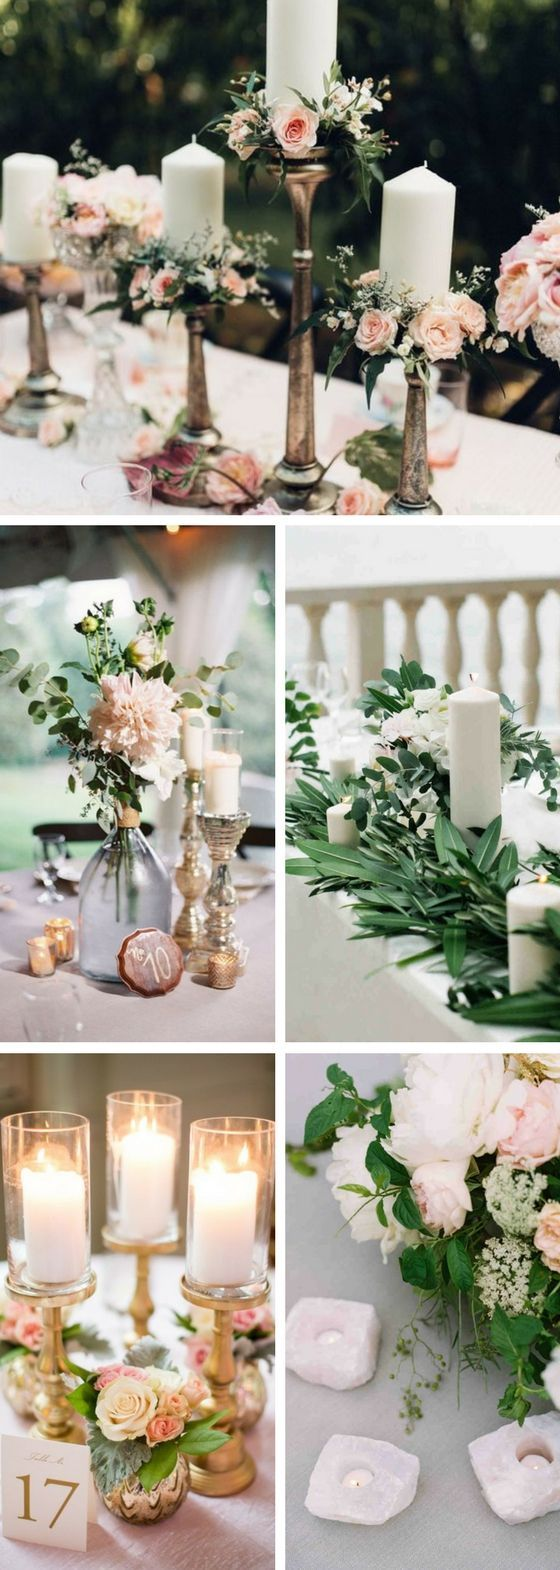 Best 25 Rustic Wedding Centerpieces Ideas On Pinterest